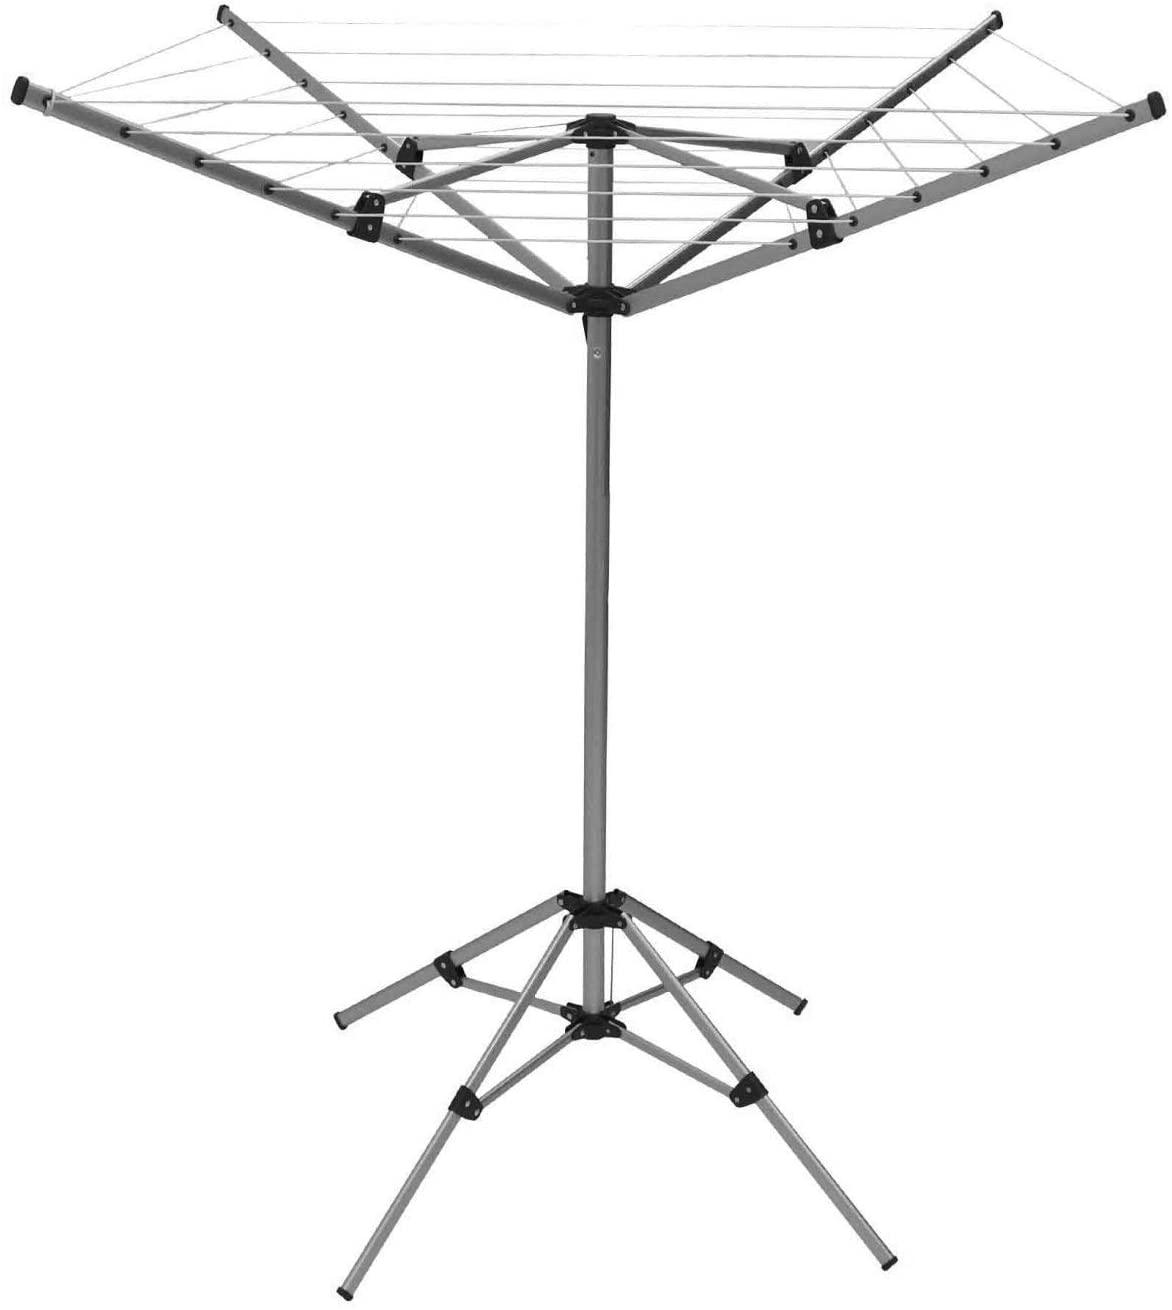 Oypla 15m 4 Arm Lightweight Free Standing Aluminium Rotary Airer